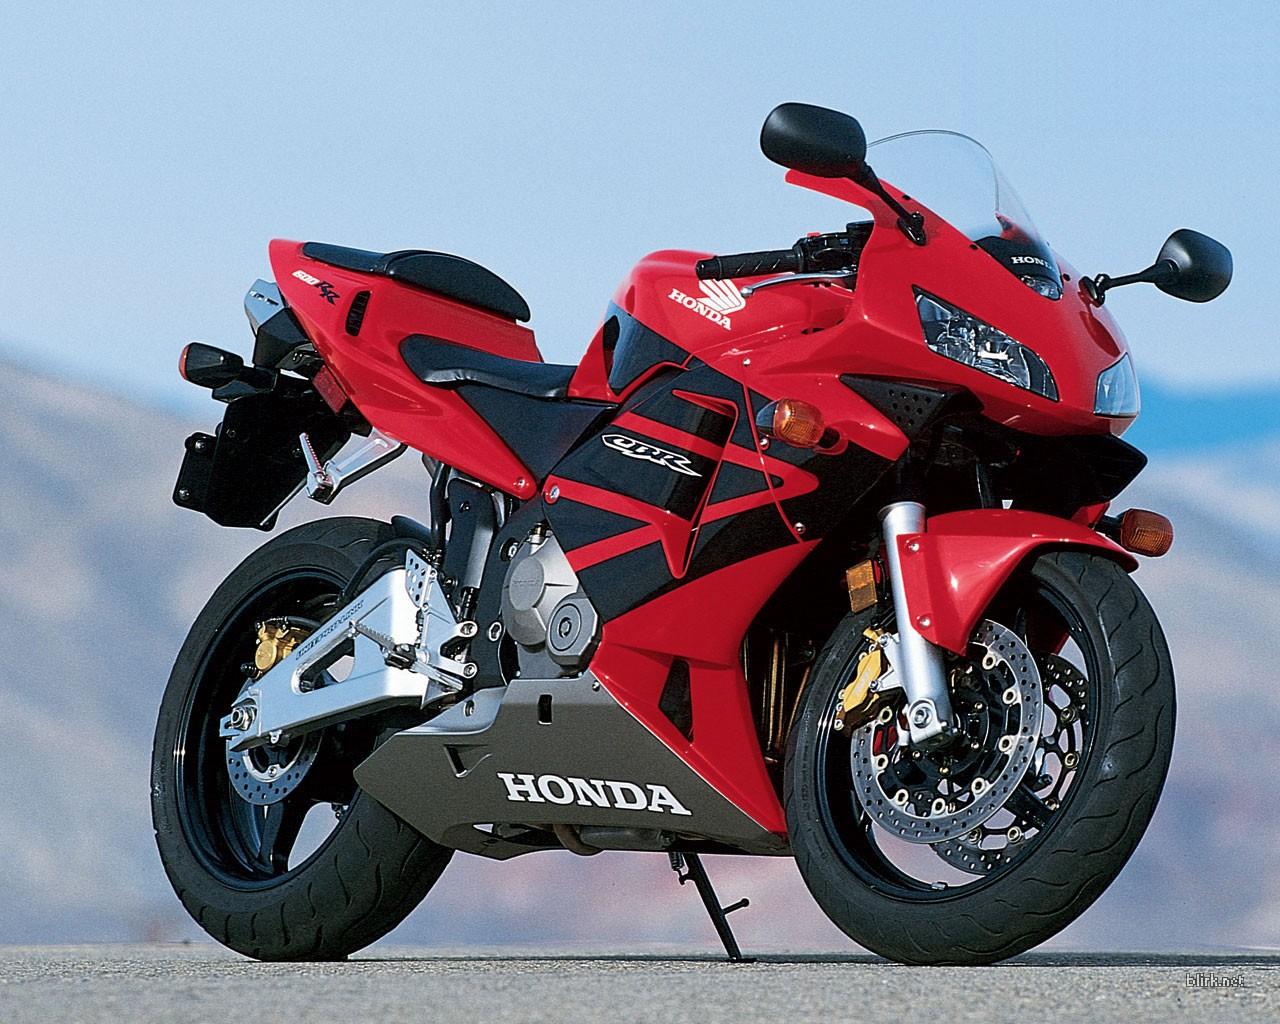 Motorcycle Reviews Amazing Honda Cbr 600 Rr